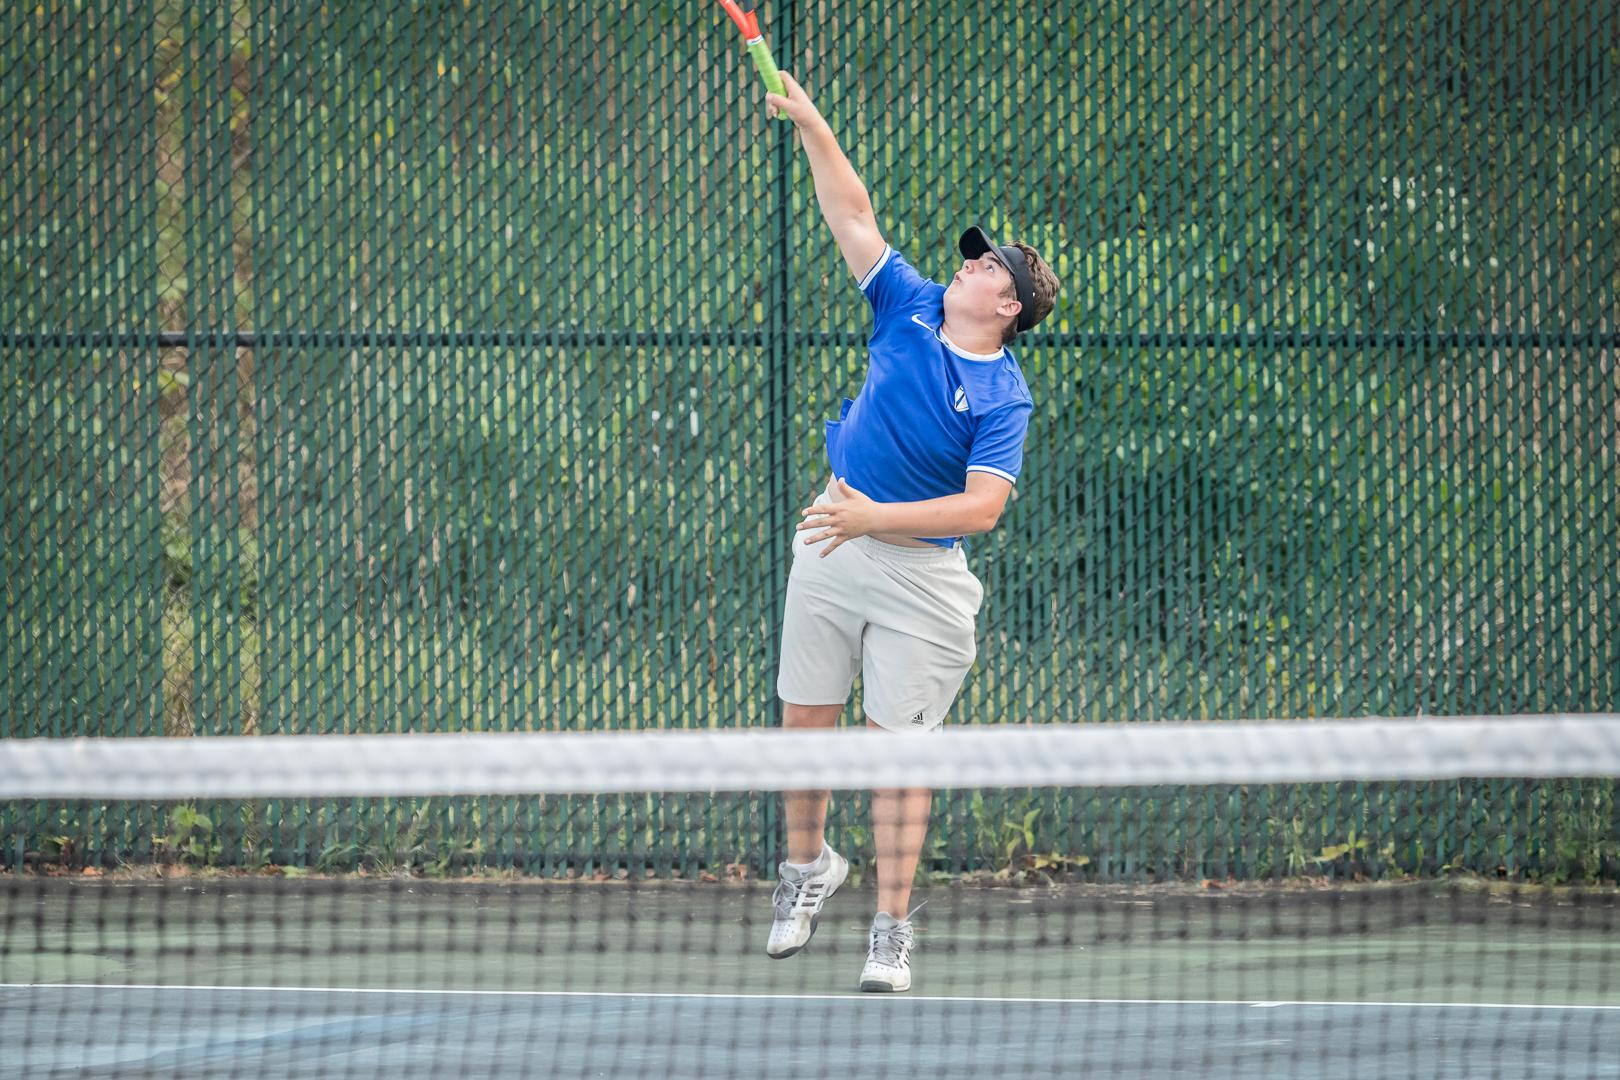 Marian-Boys-Tennis-1631.jpg